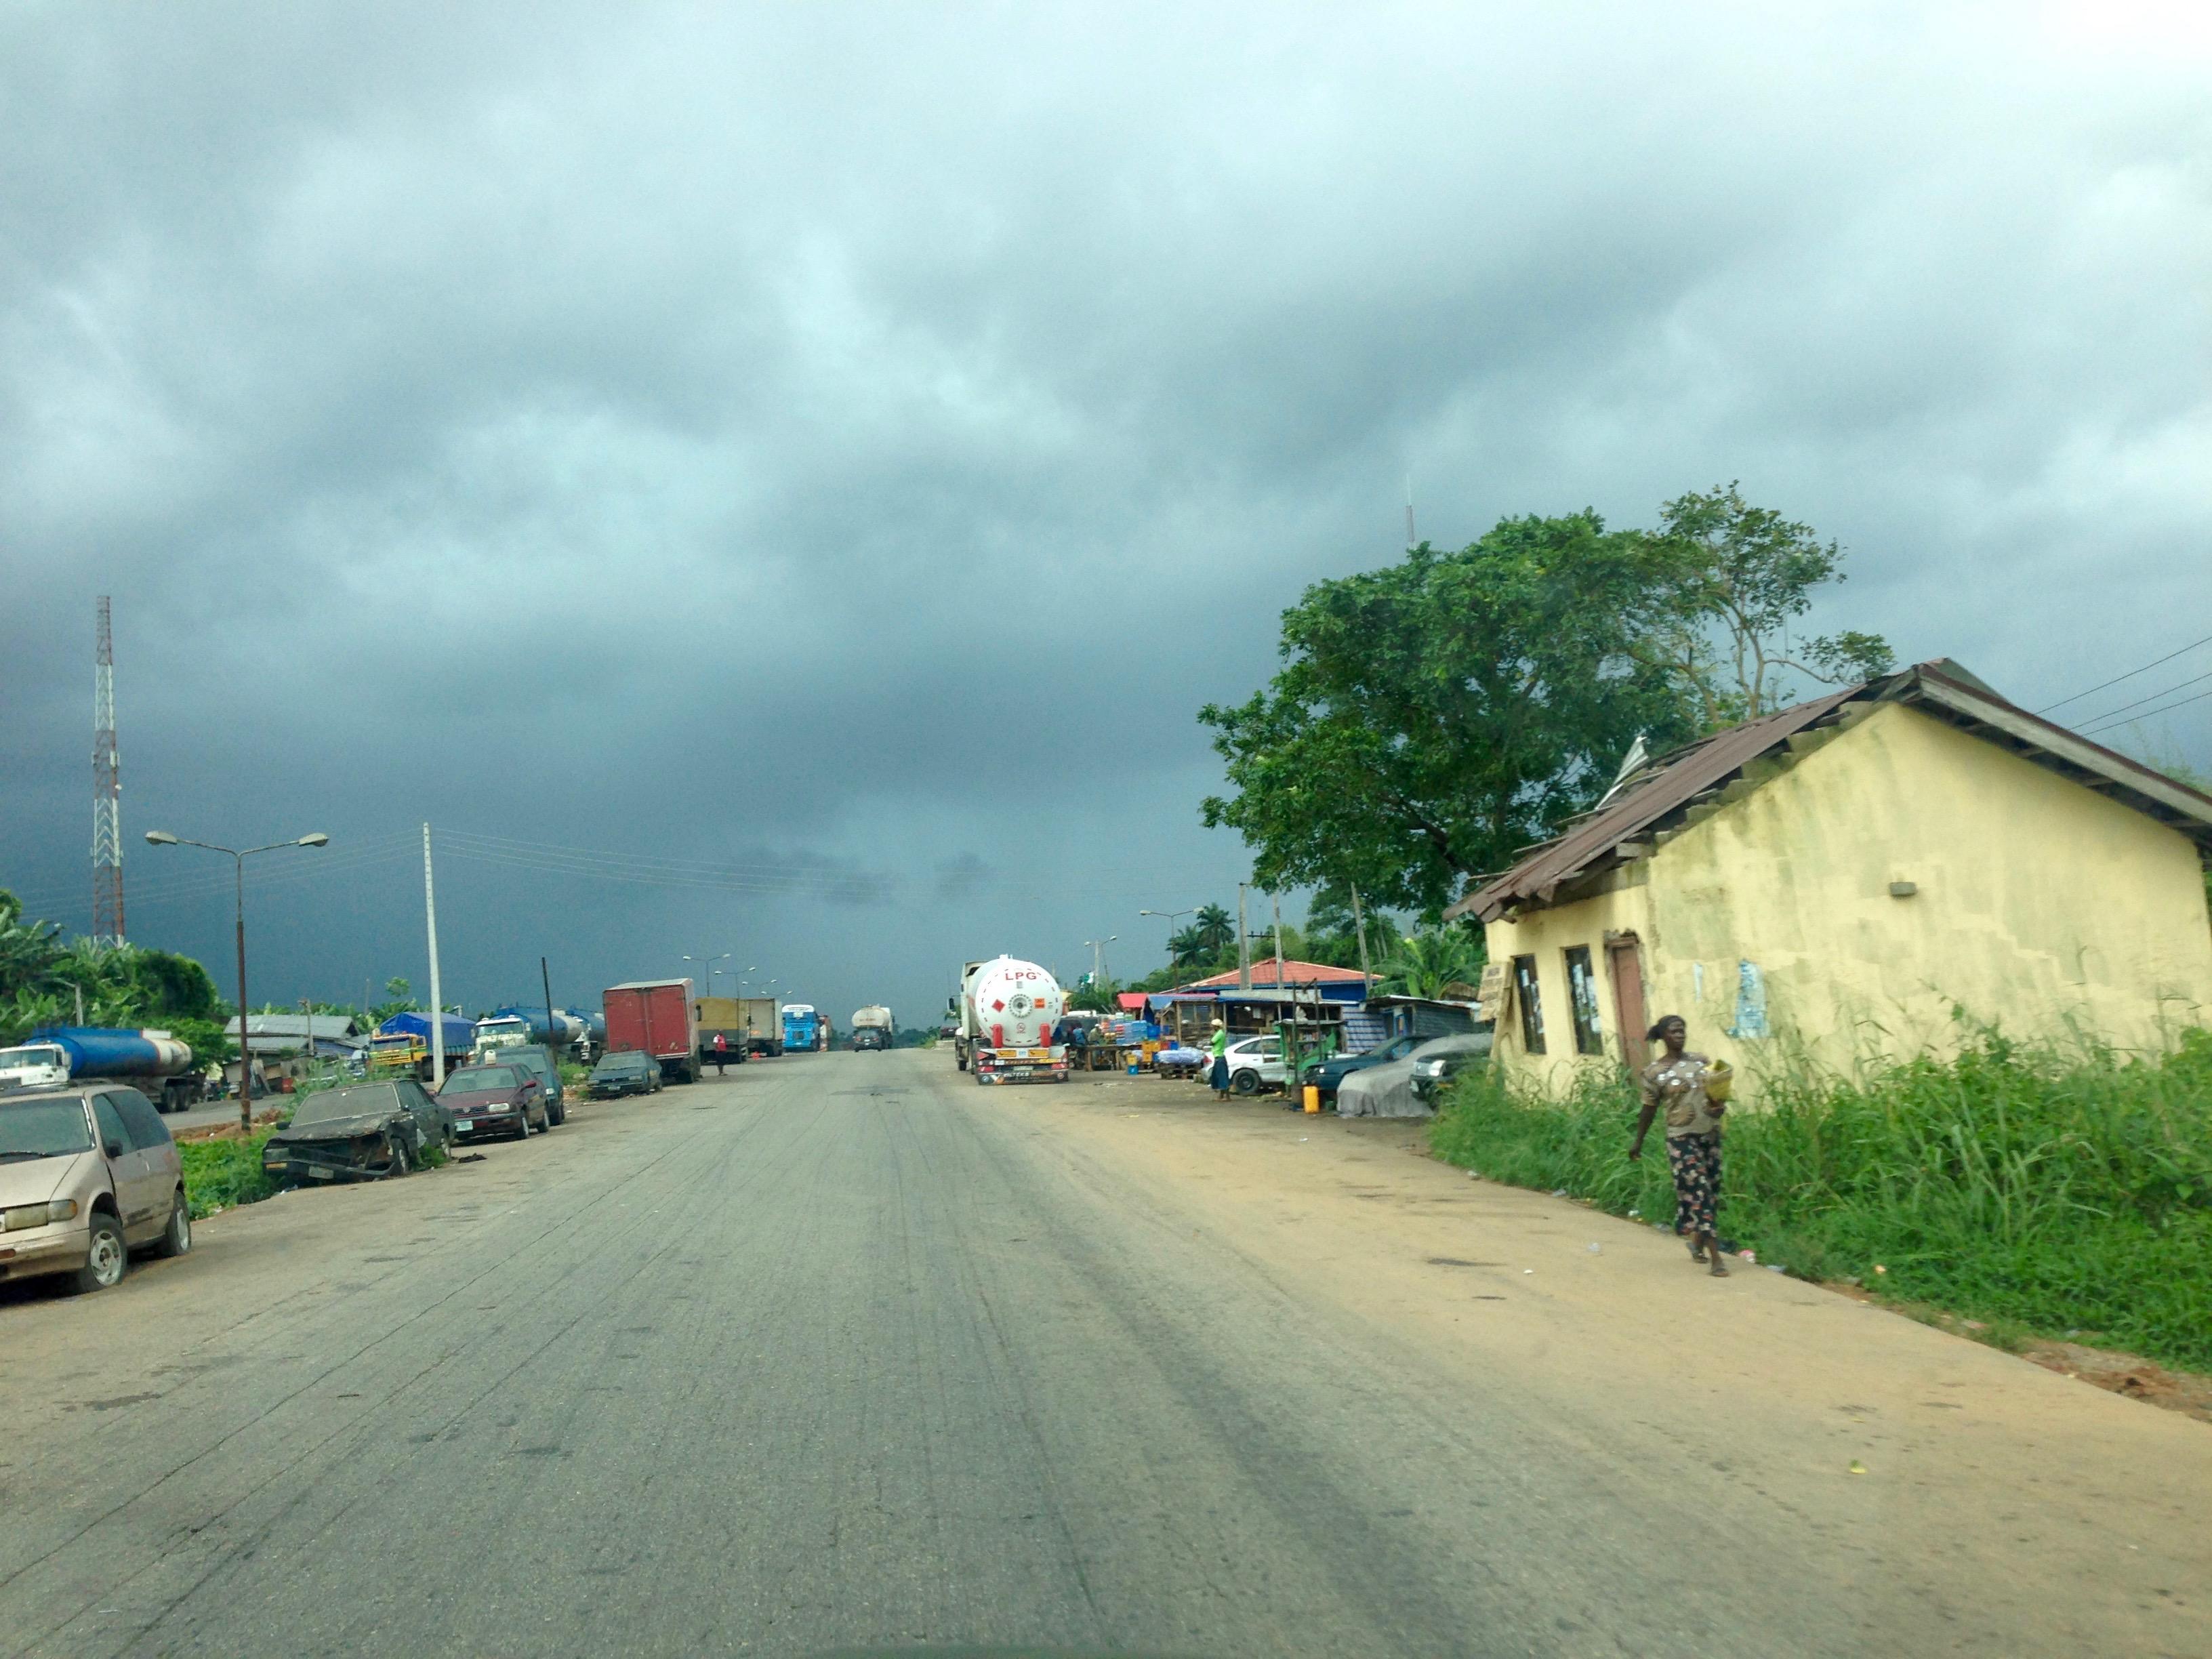 Ife/Ibadan Highway, Ode Omu, Osun, Nigeria. #JujuFilms